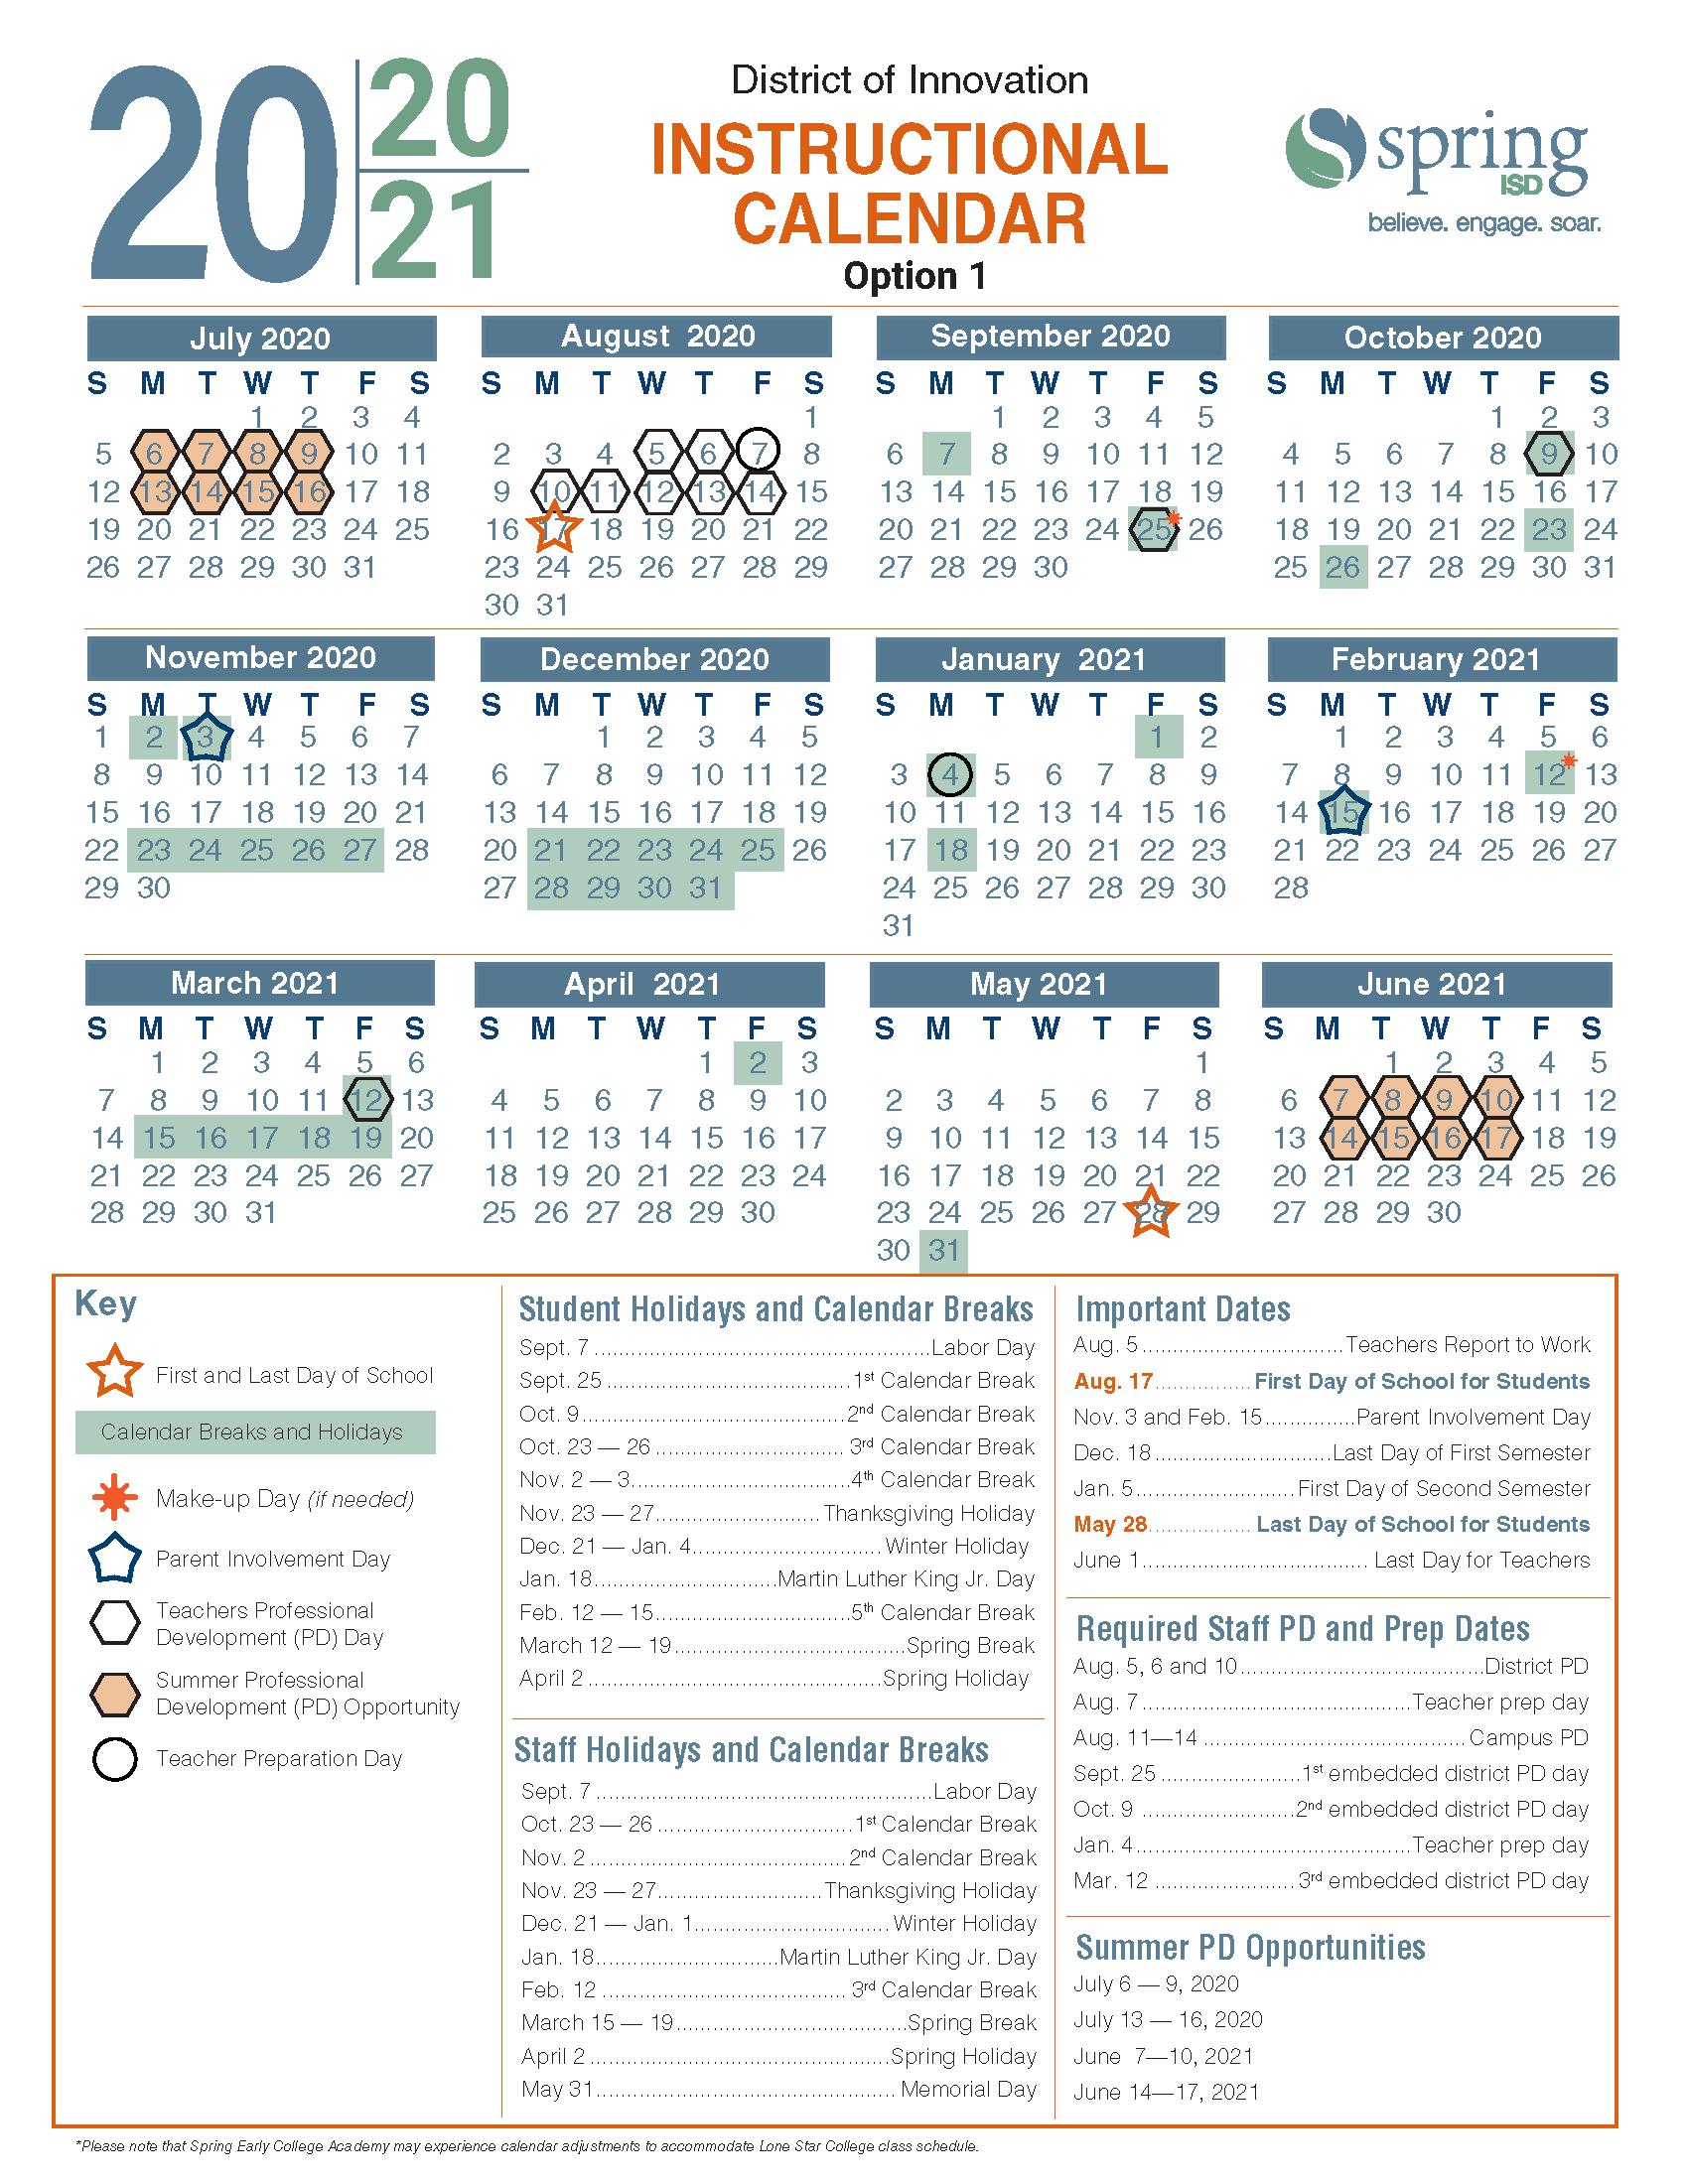 Calendar Survey / 2020-21 Instructional Calendar